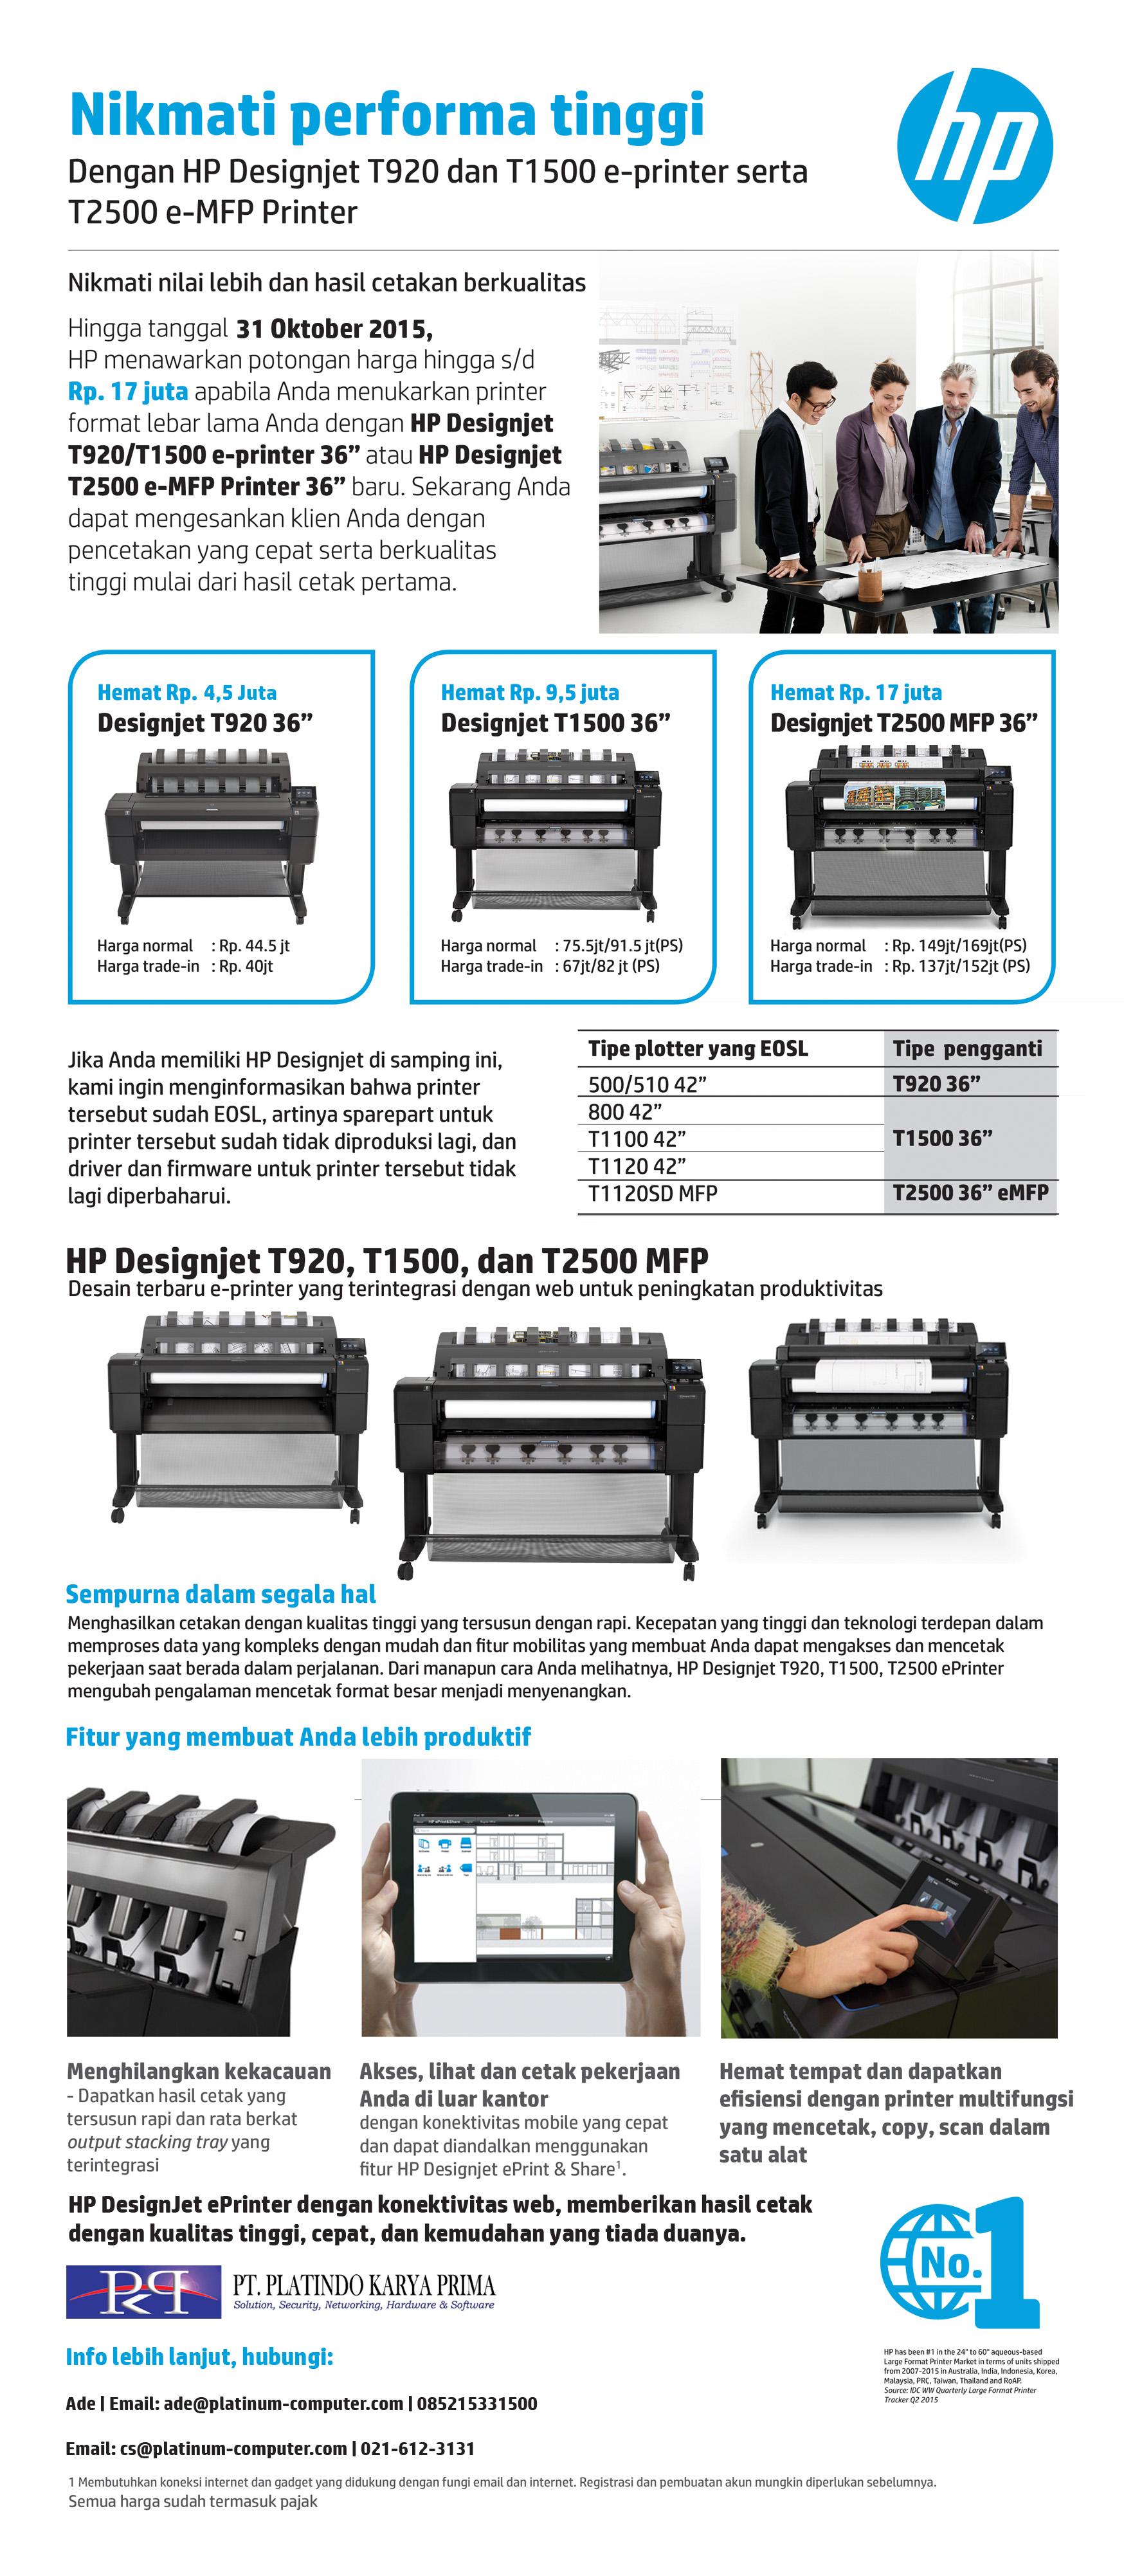 gambar Hp Designjet T920, T1500 e-printer, dan T2500 e-MFP Printer